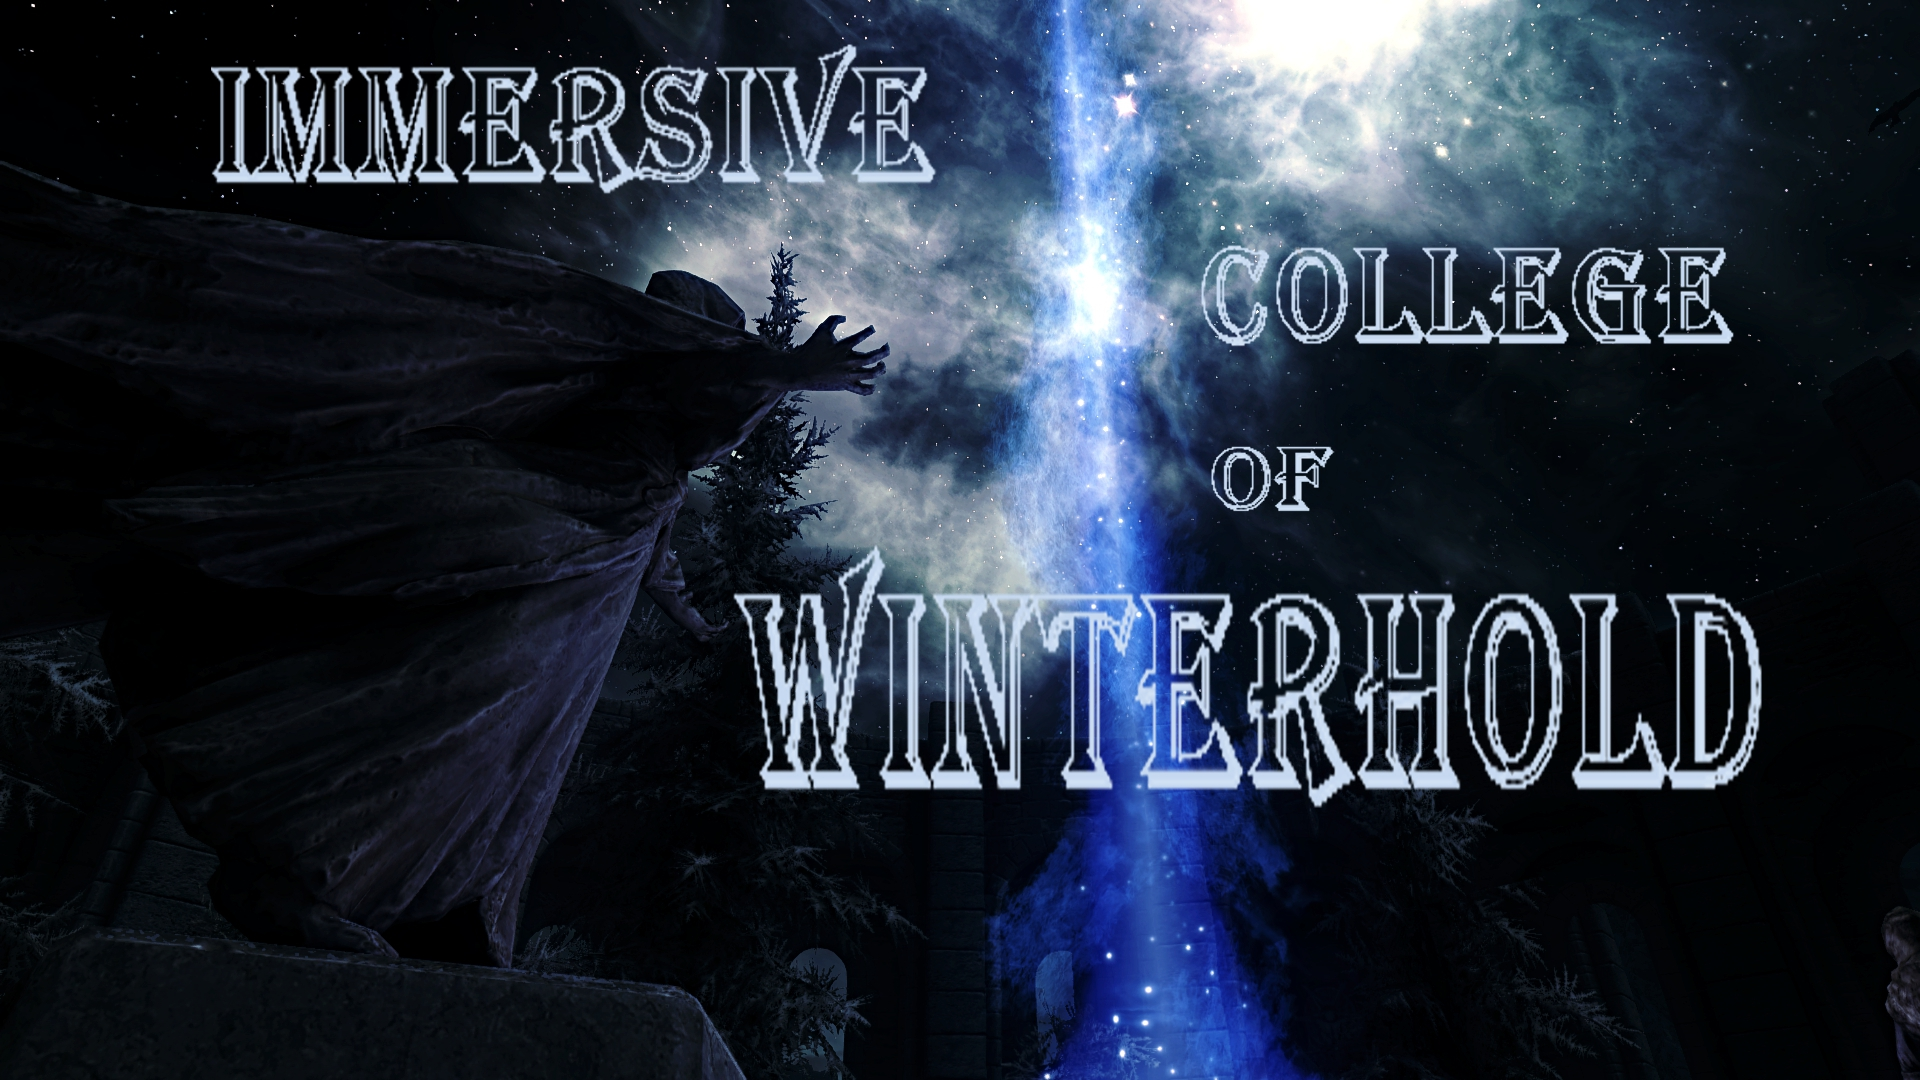 Immersive College of Winterhold | The Elder Scrolls Mods Wiki